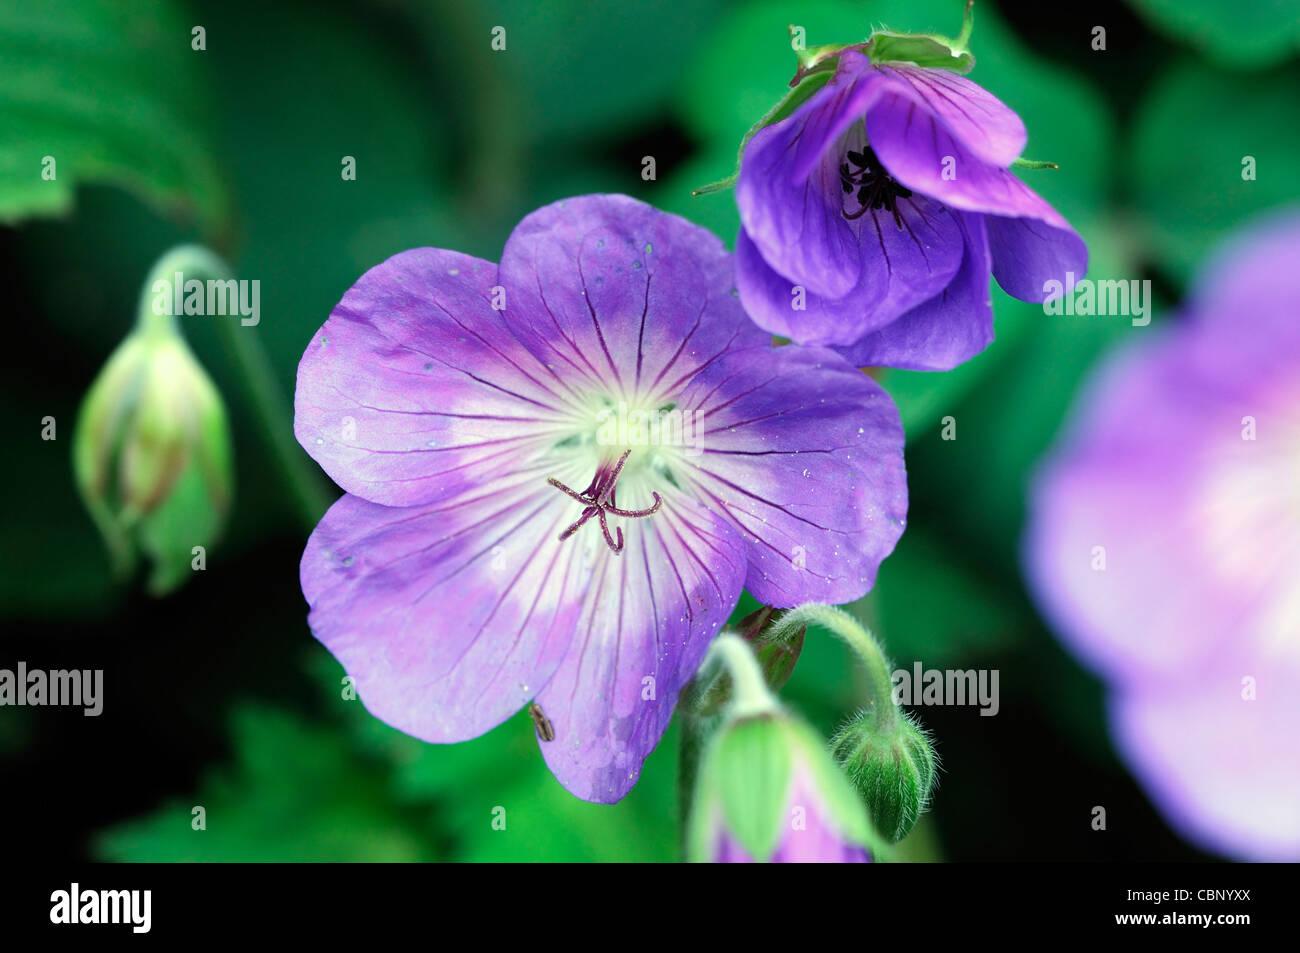 Storchschnabel jolly Bee Rozanne Storchschnabel Blumen Blüten-Blüten-Stauden blau lila Closeup hautnah Stockbild